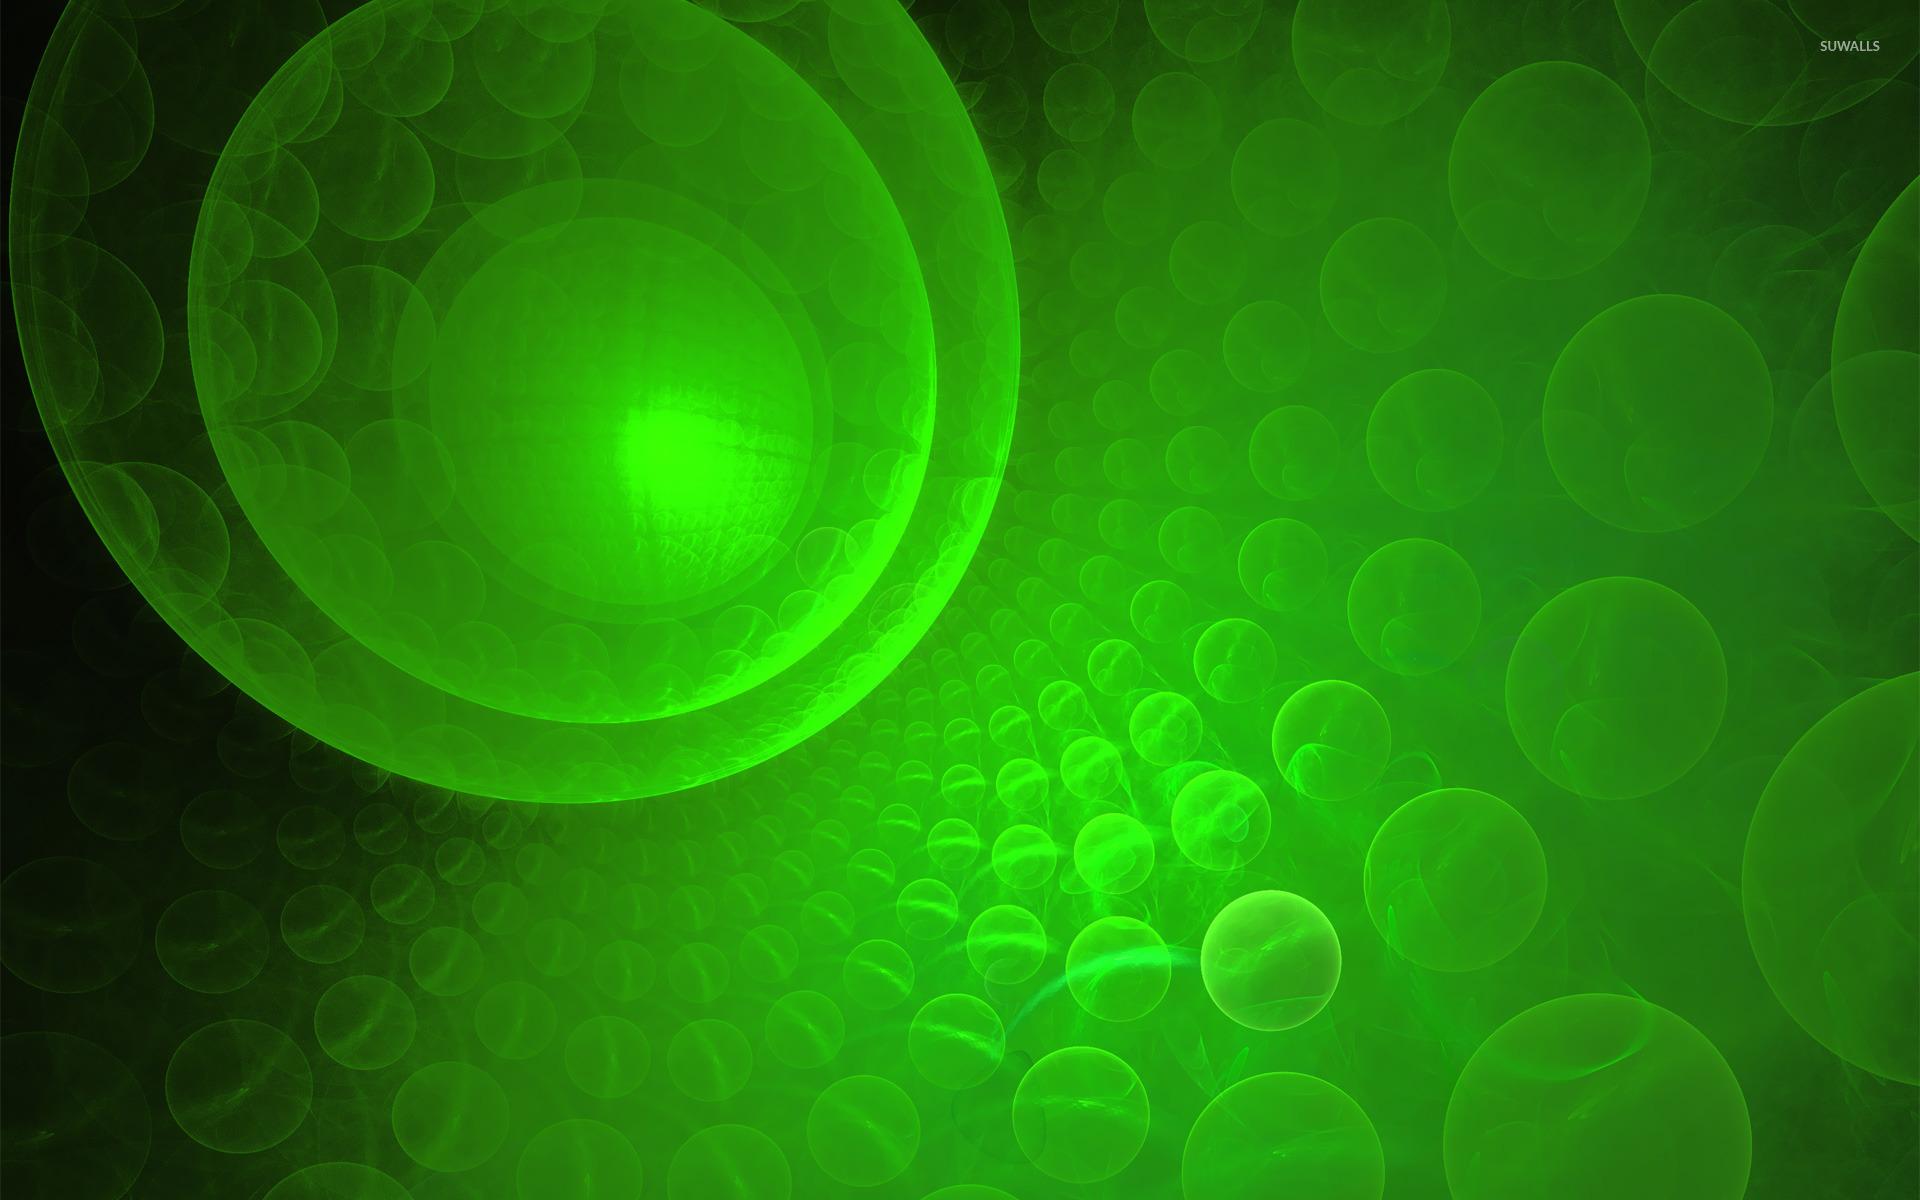 Green Bubble Wallpapers WallpaperPulse